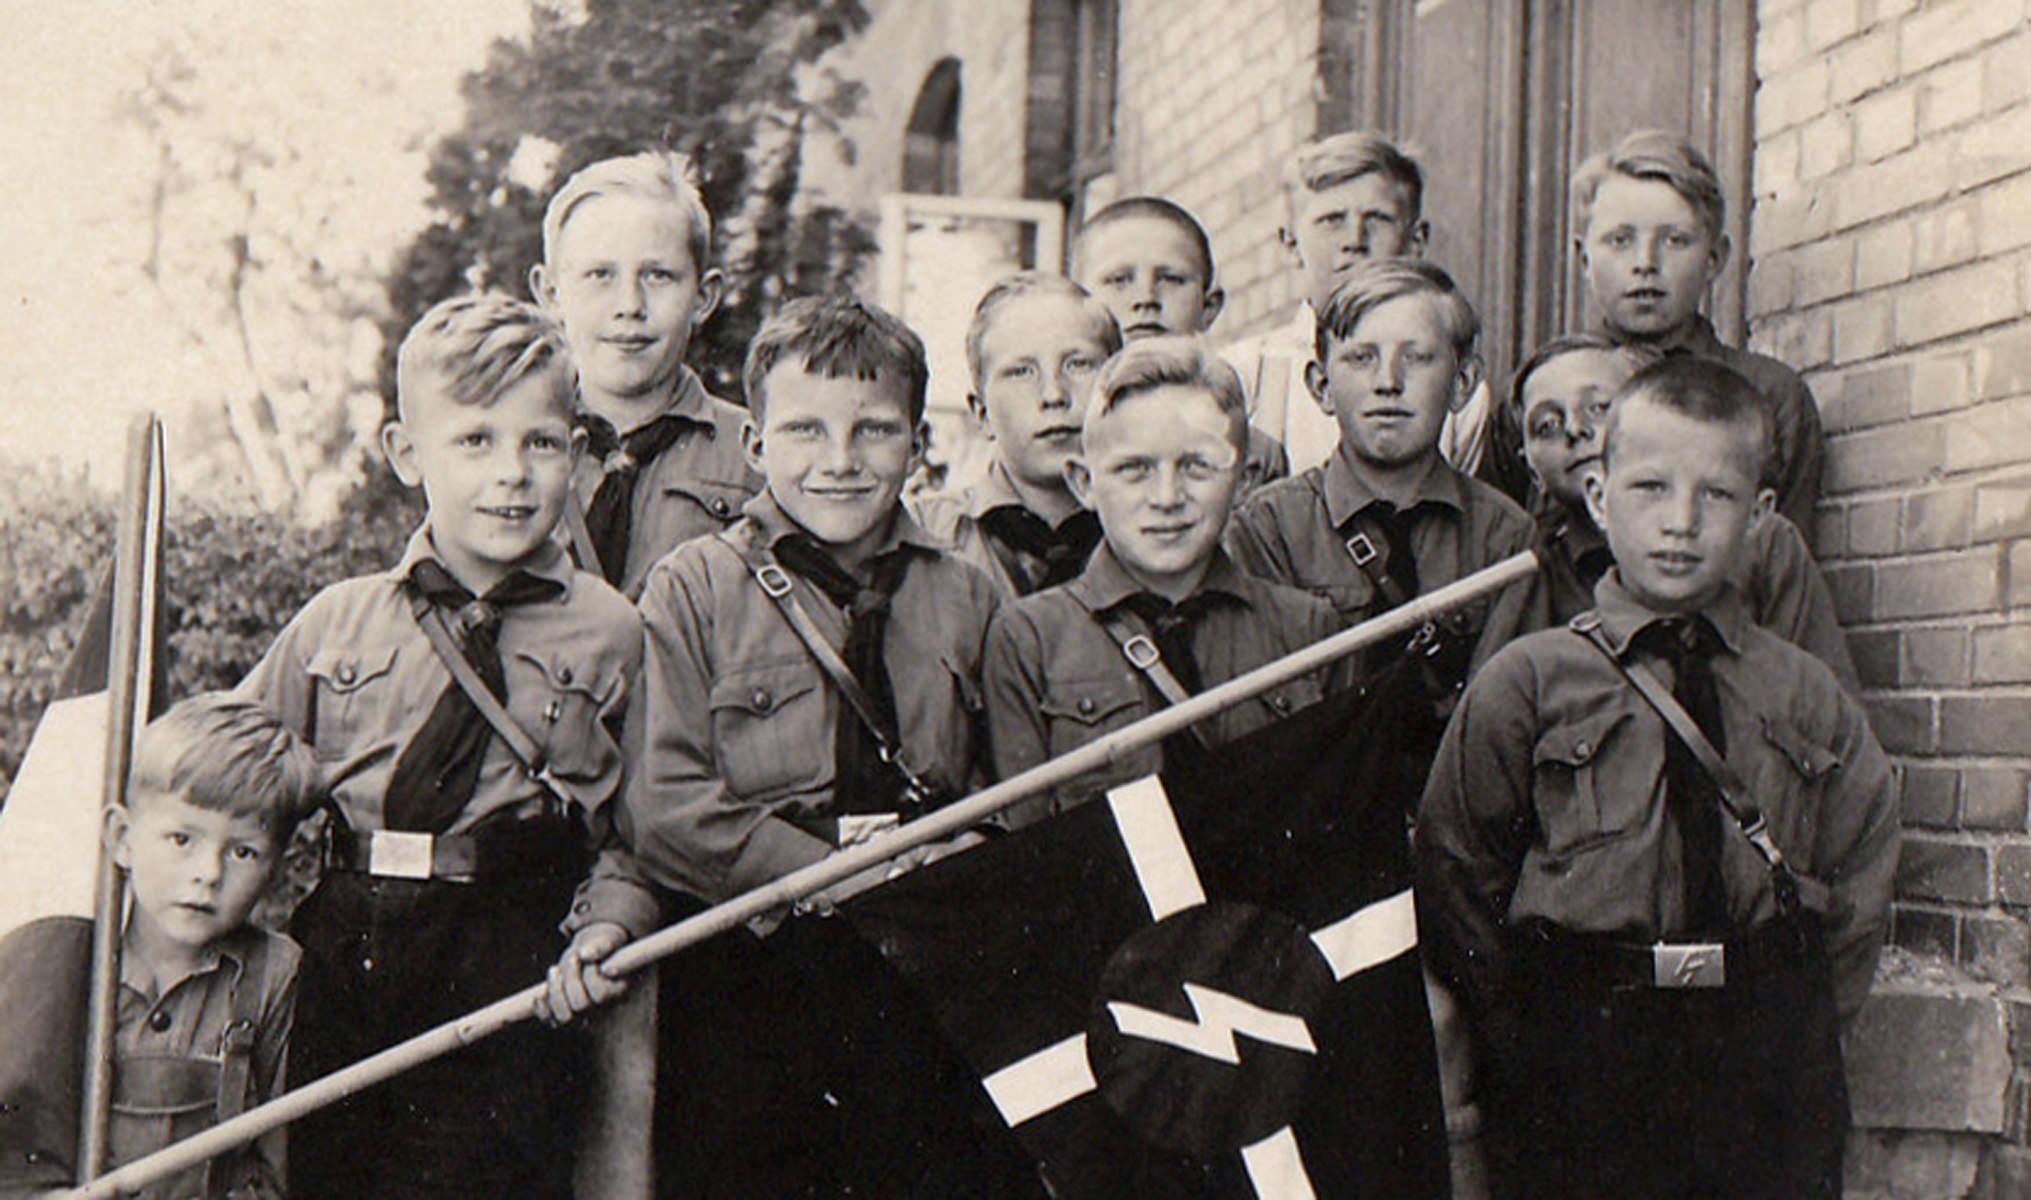 Hitlerjugend, Jungvolk, HJ, Pimpfe mit Wimpel an der Schule in Eggeberg. Foto Leihgabe von Wolfgang Modersohn.